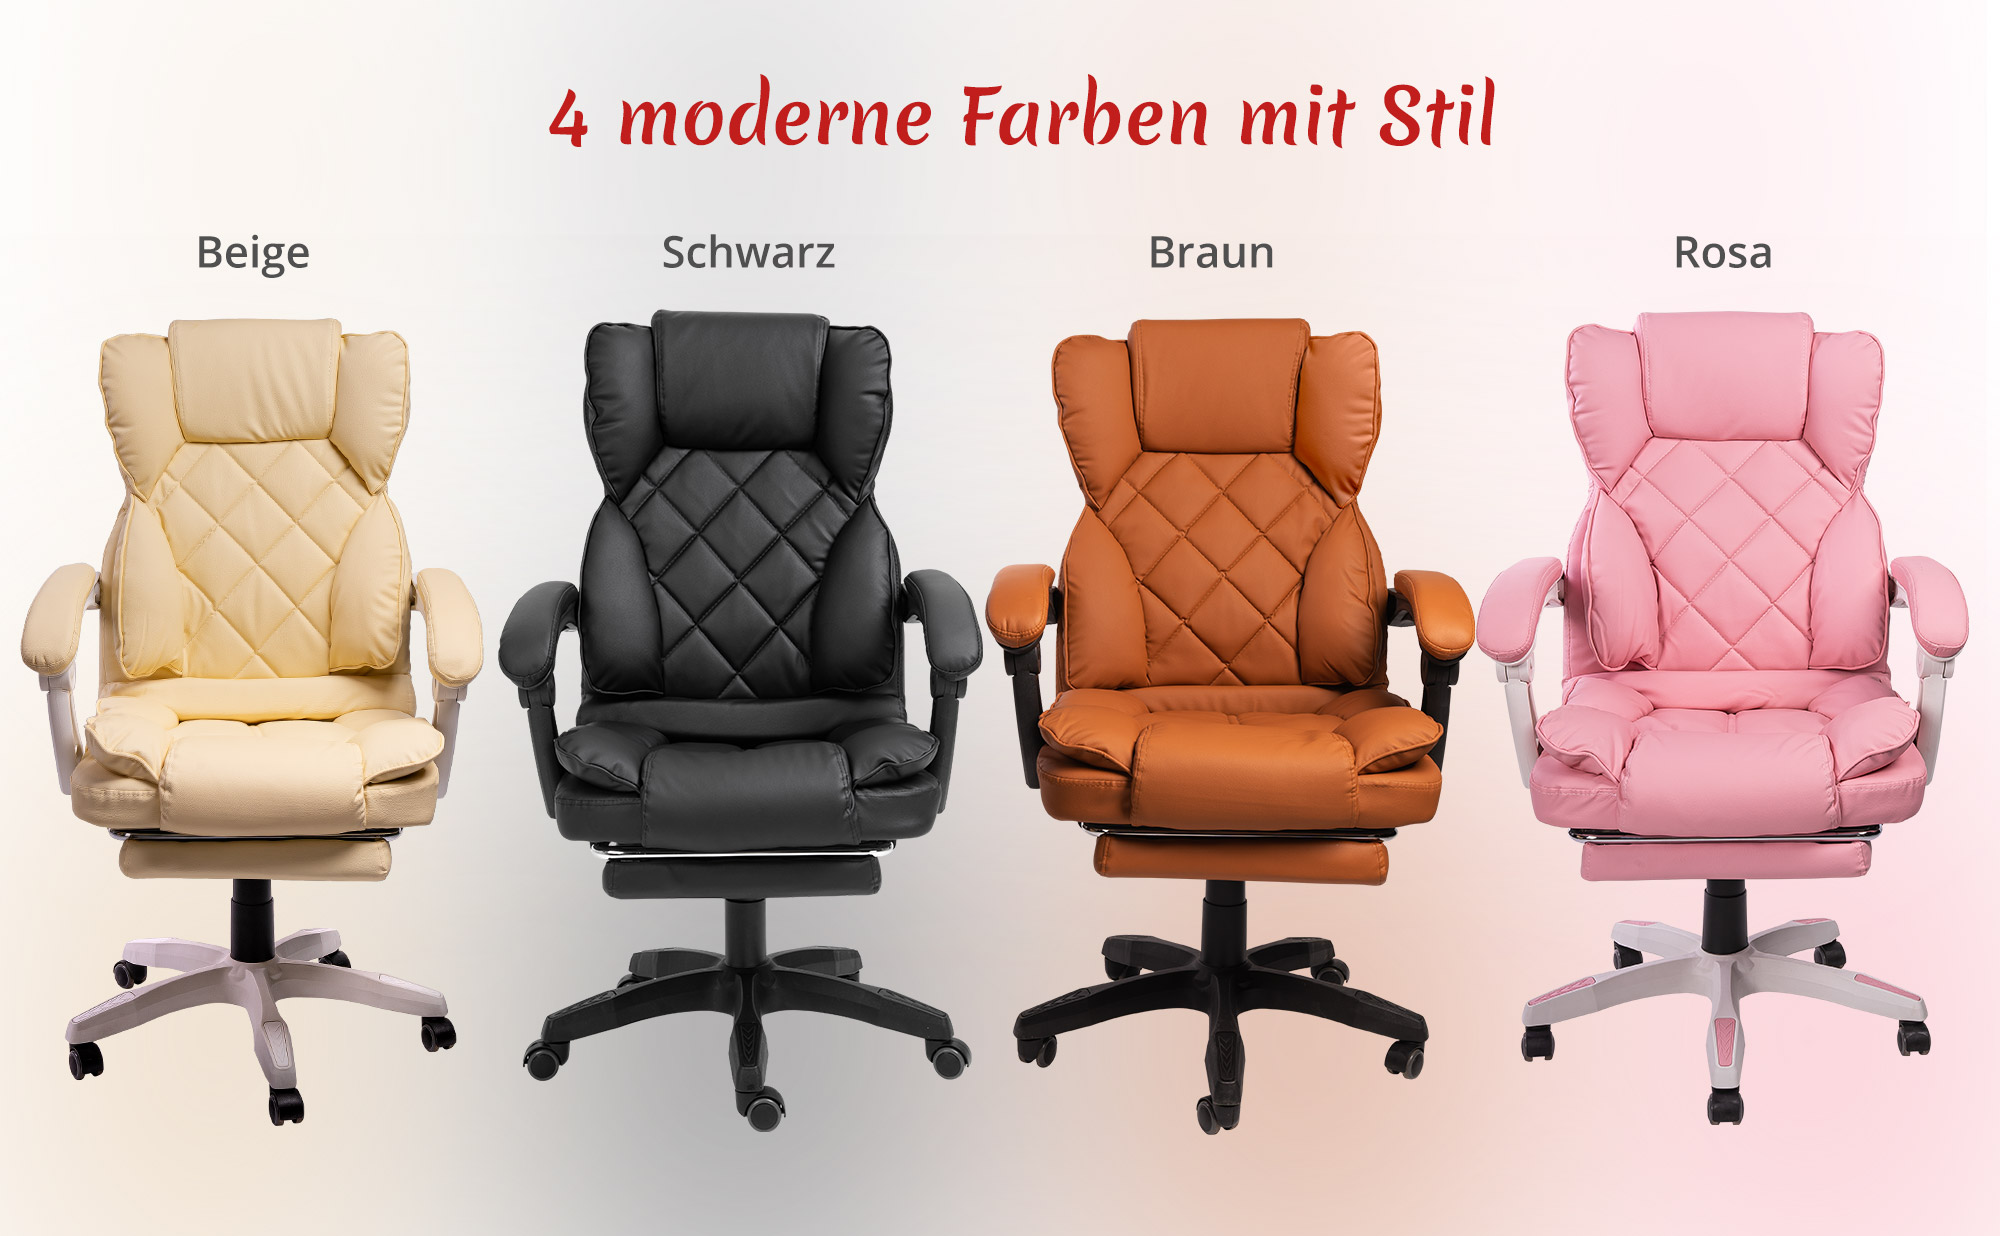 Details zu Schreibtischstuhl | Design Bürostuhl TV Sessel Chefsessel Relax & Home Office